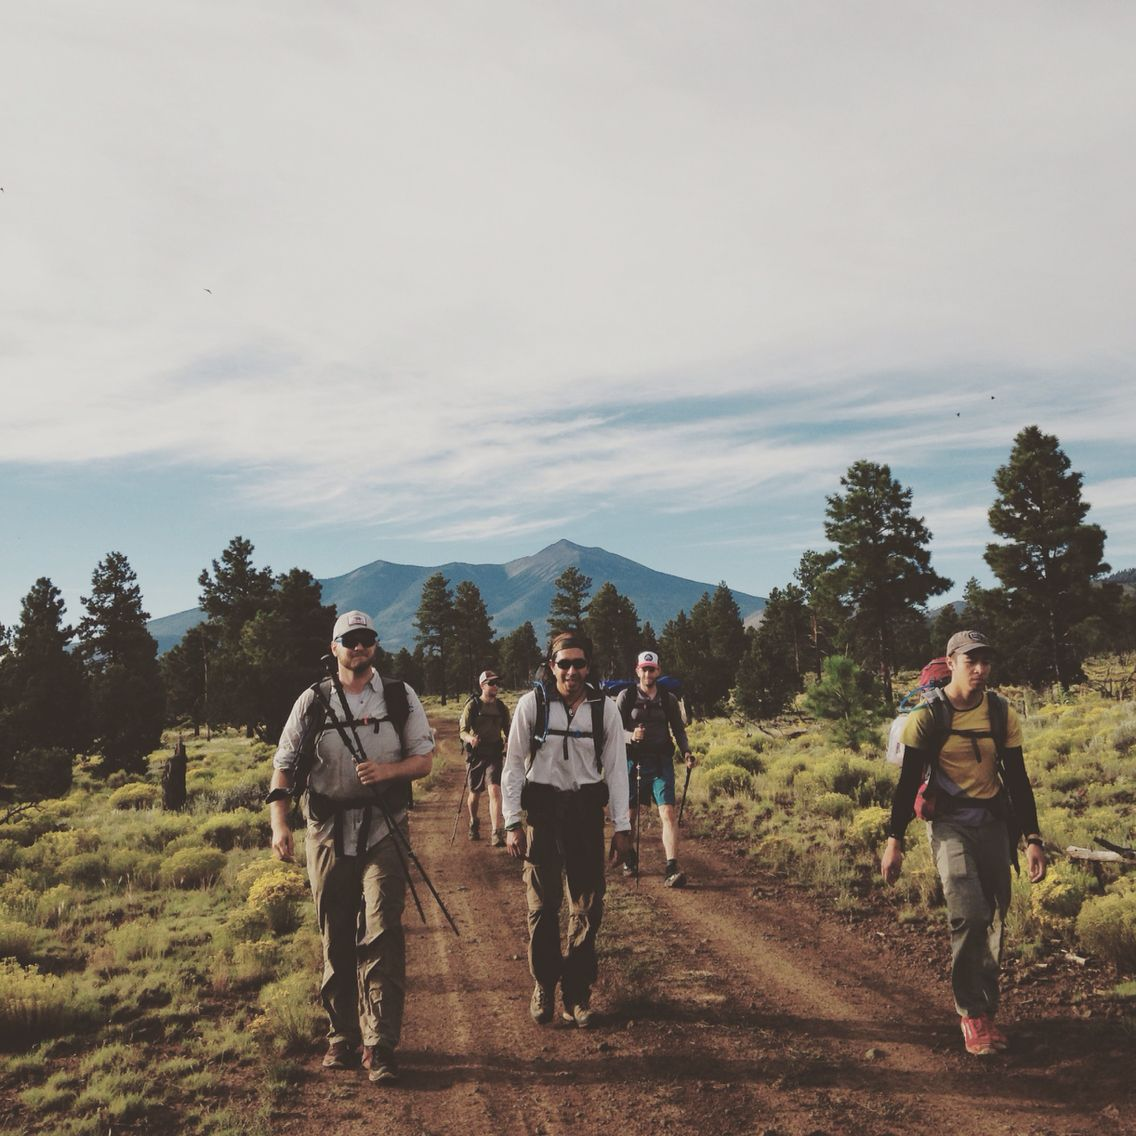 Arizona National Scenic Trail - Passage 34 #backpacking #Flagstaff #AZT